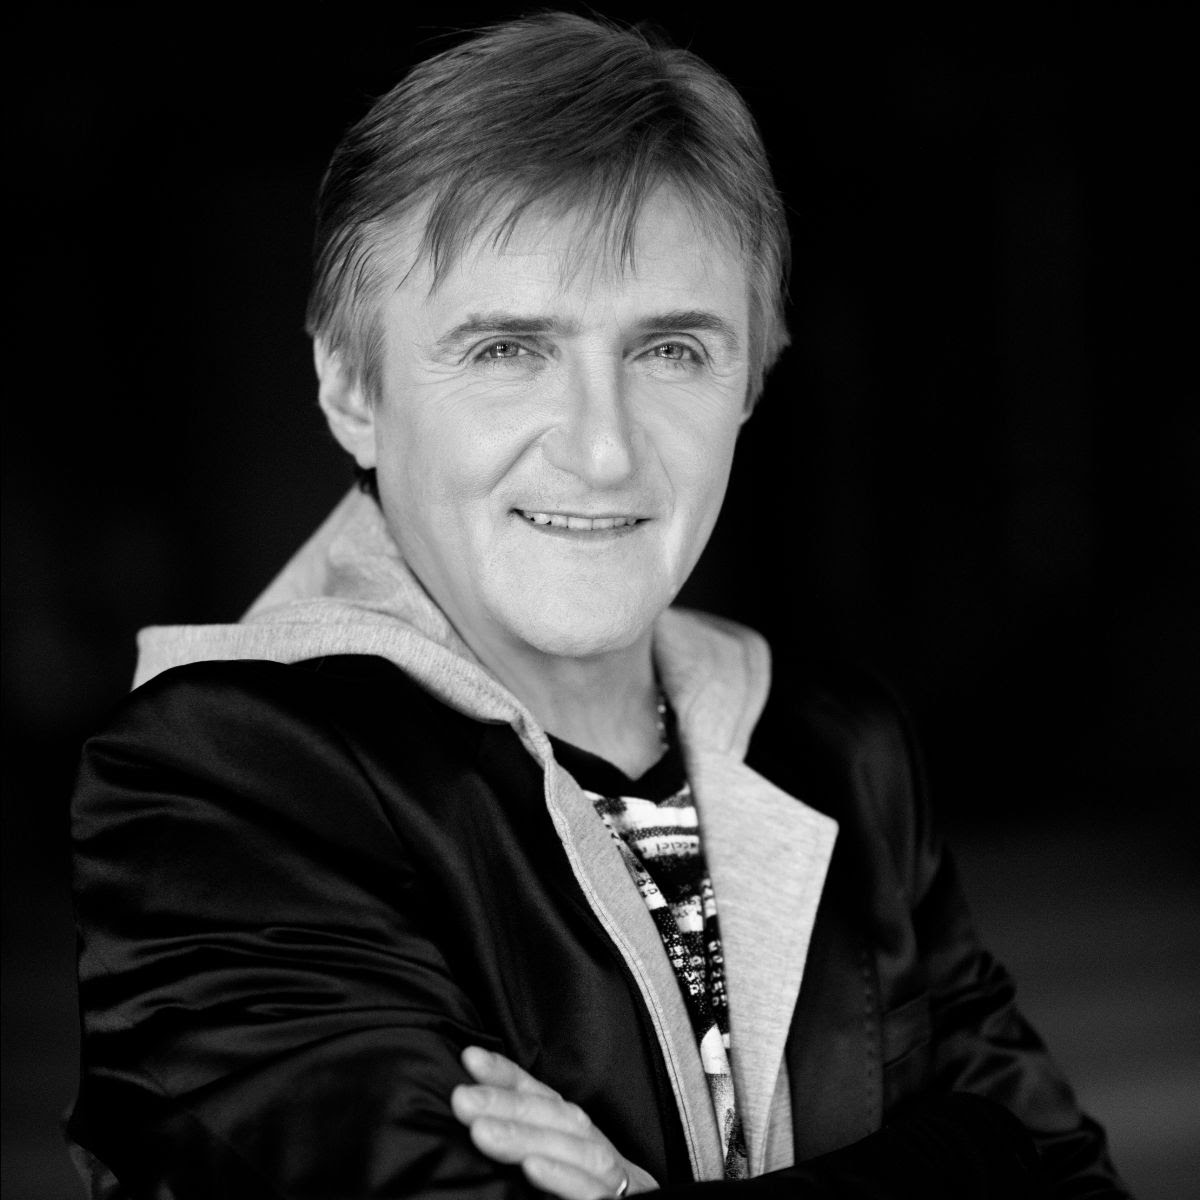 IN MEMORIAM RAJKO DUJMIĆ (7.8.1954. – 4.8.2020.)